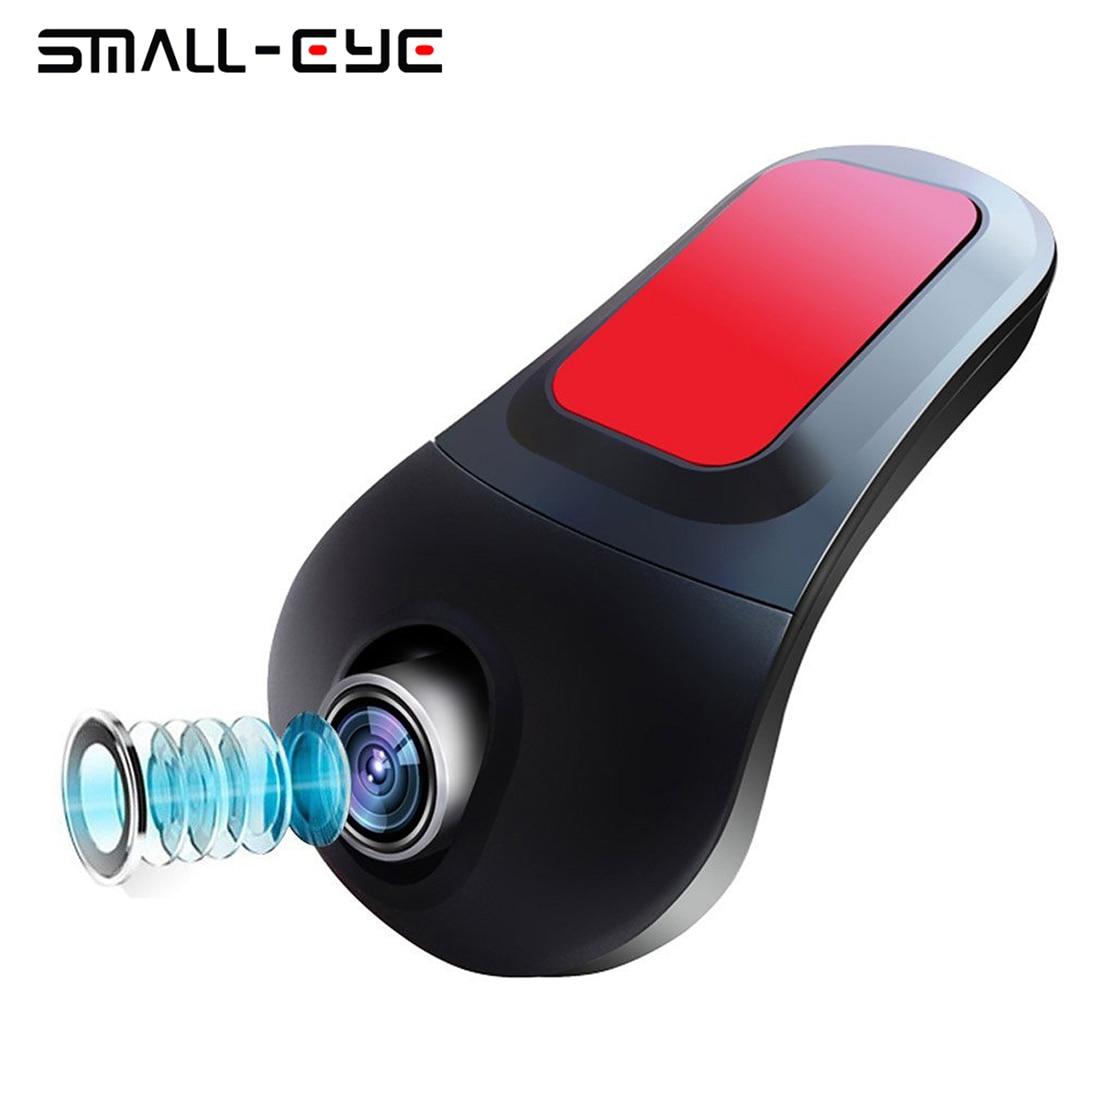 SMALL EYE font b Car b font font b DVR b font Registrator Dash Camera Cam